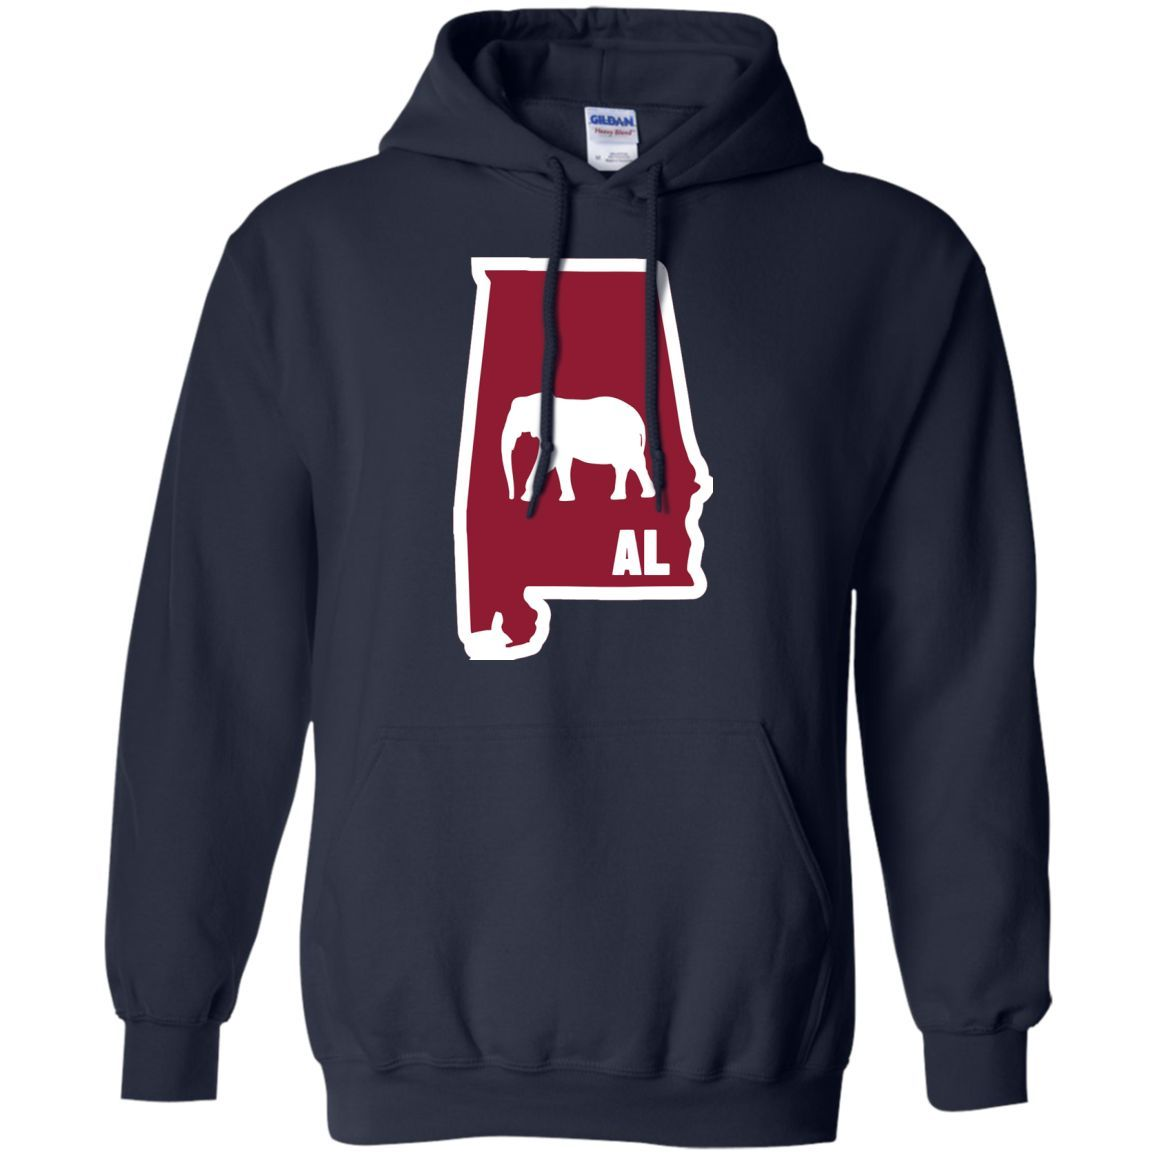 I Elephant Alabama Variant Classic University Vinyl Pullover Hoodie 8 oz